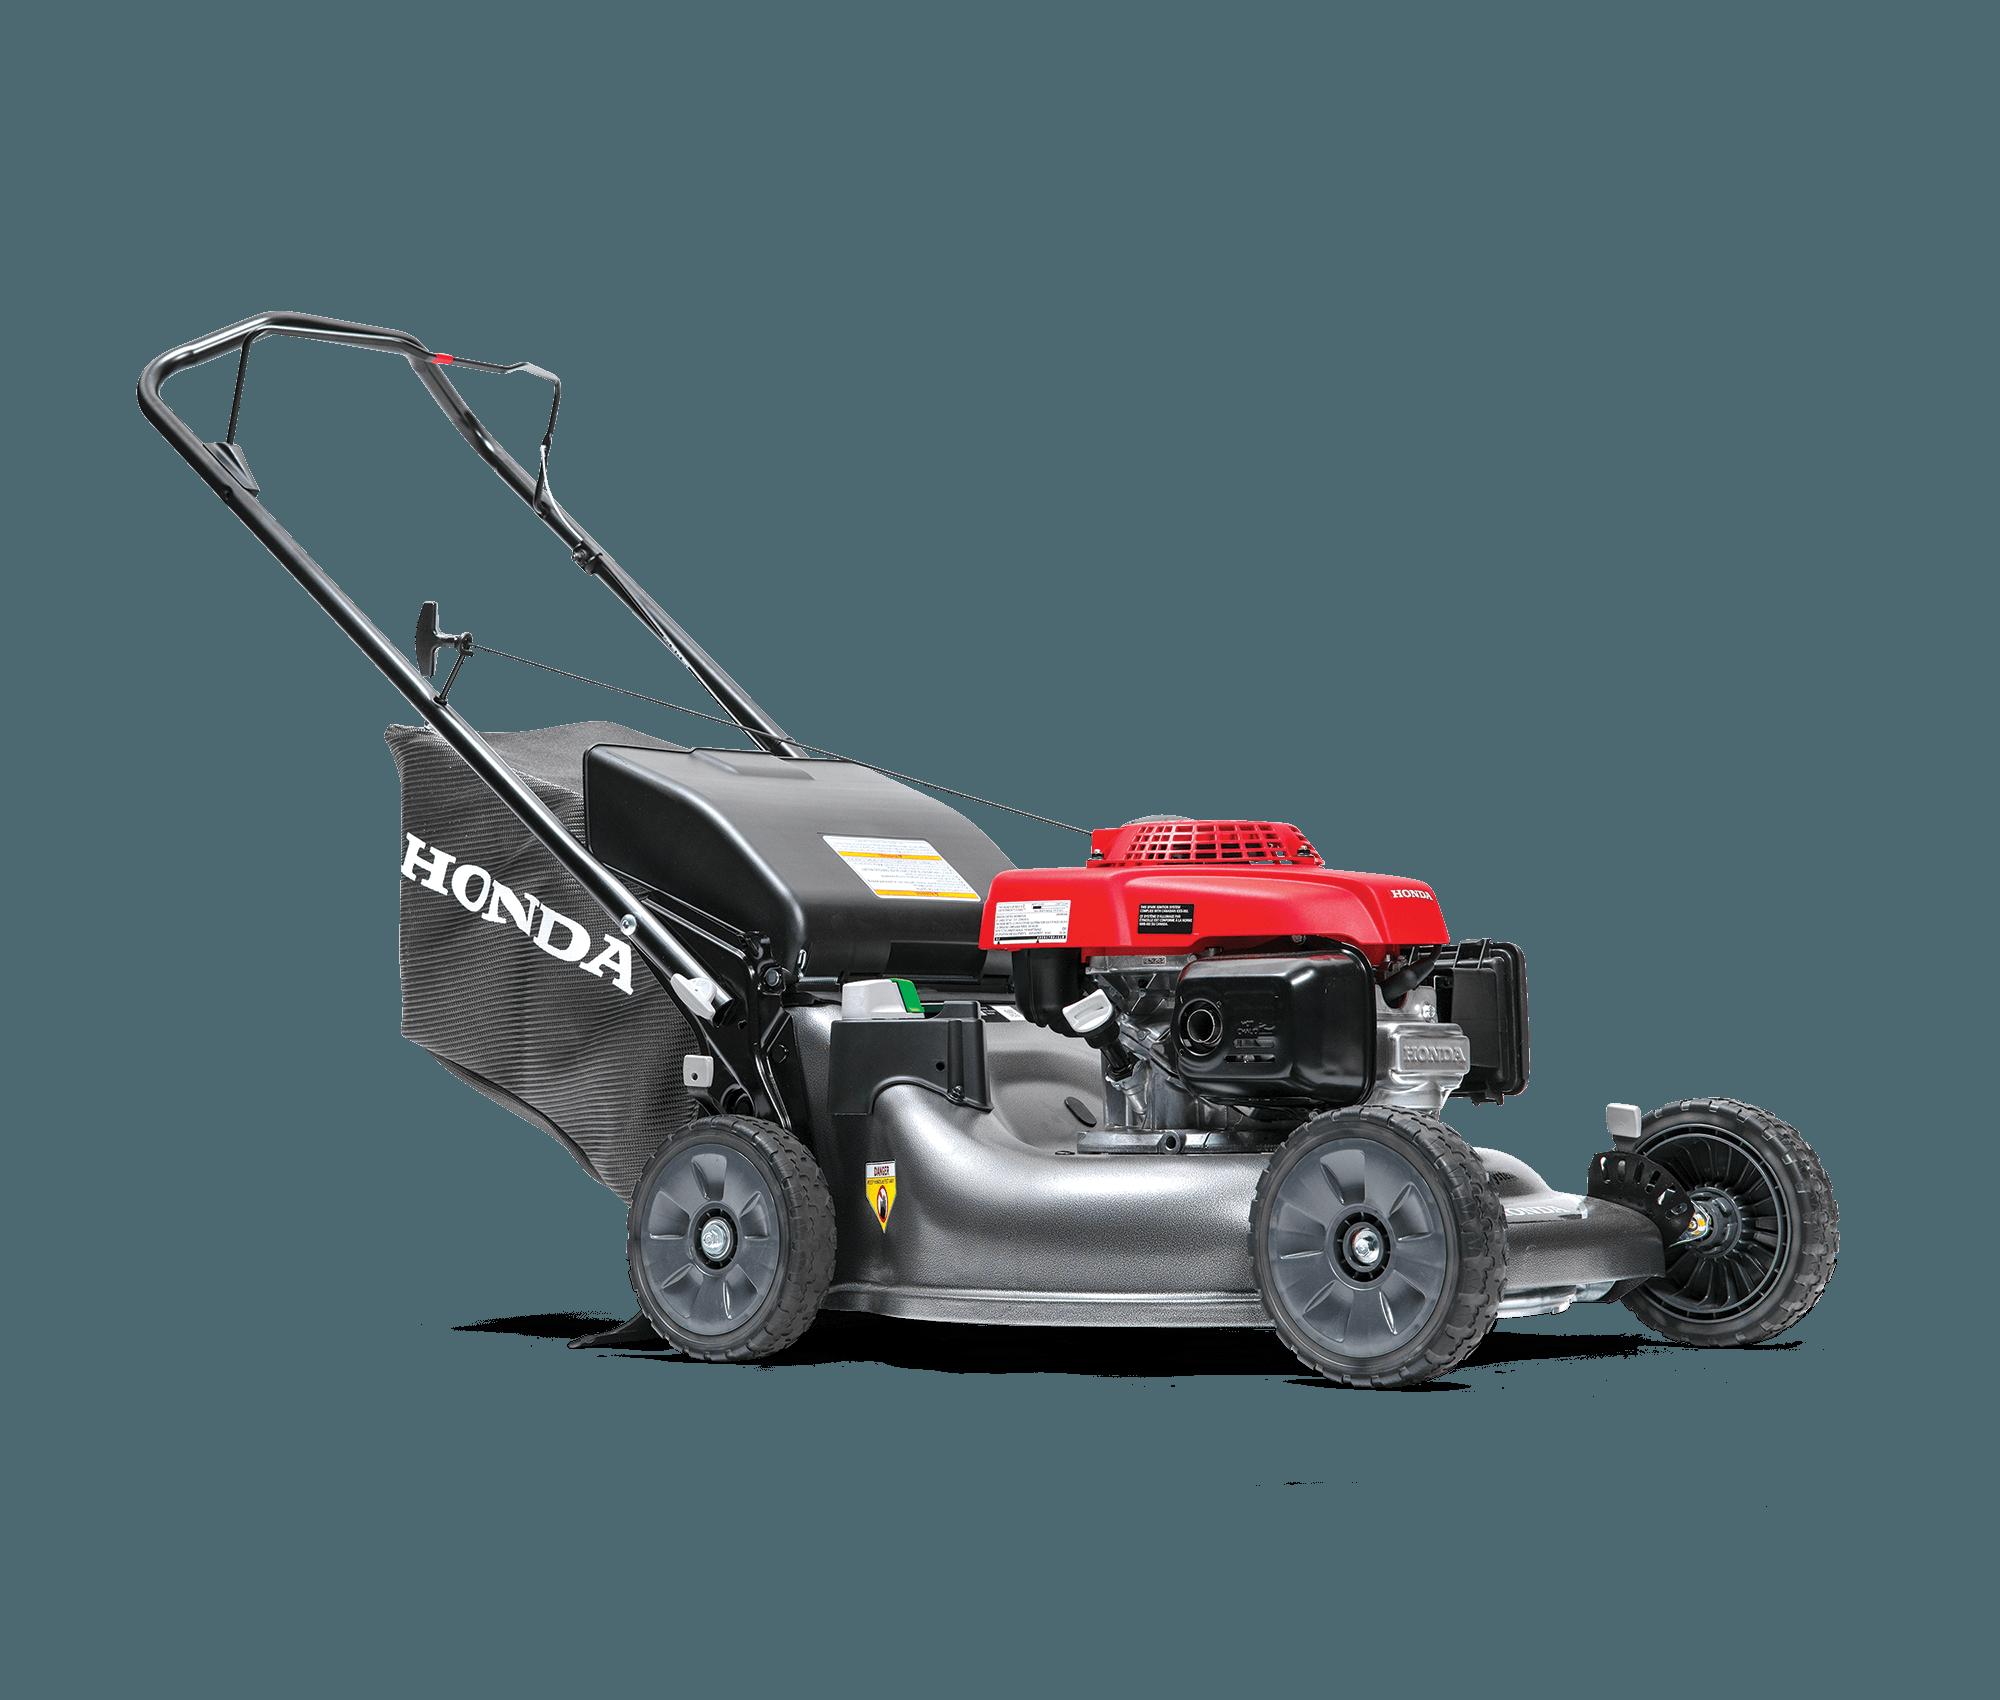 HRR216 Lawnmower